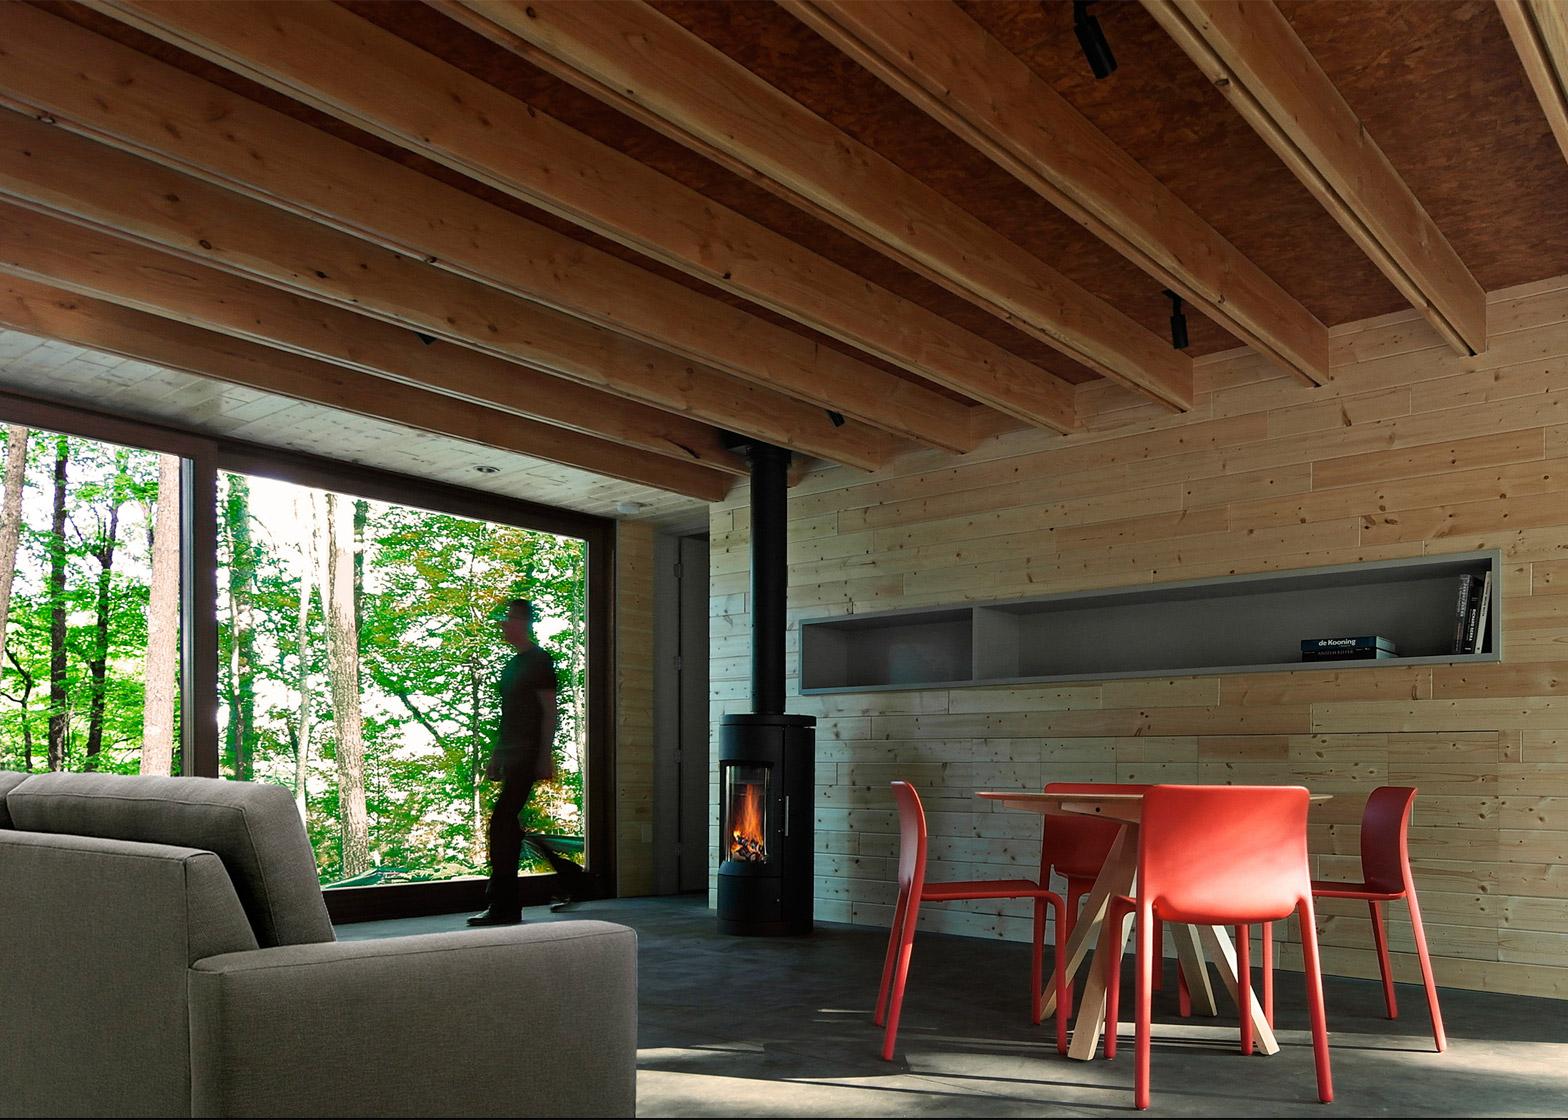 architecture_house_in_forest_design_studia_interiors_osnovadesign_osnova_poltava_05